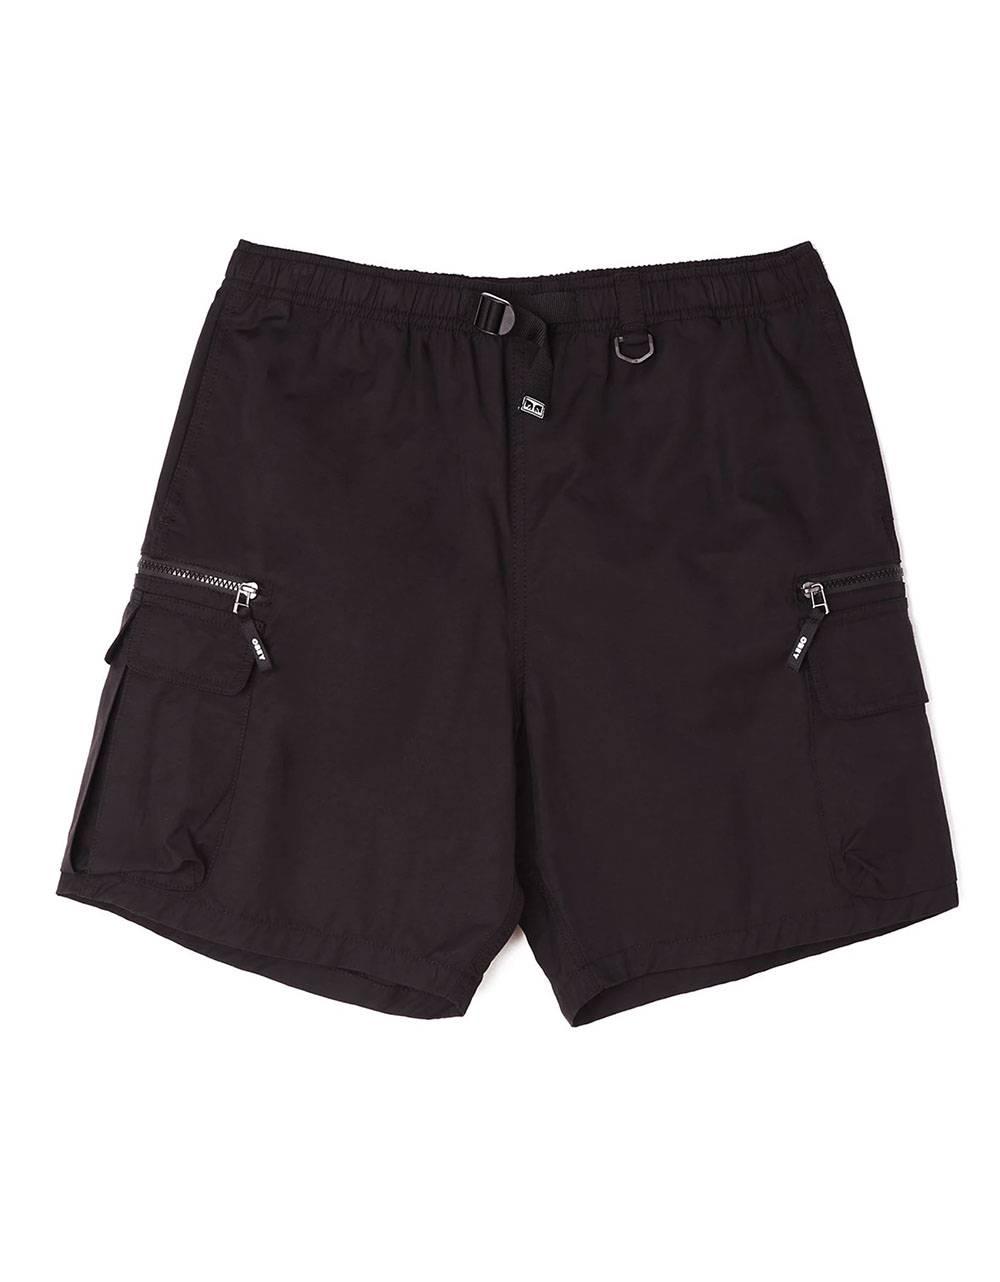 Obey Warfield trek shorts - black obey Shorts 77,87€